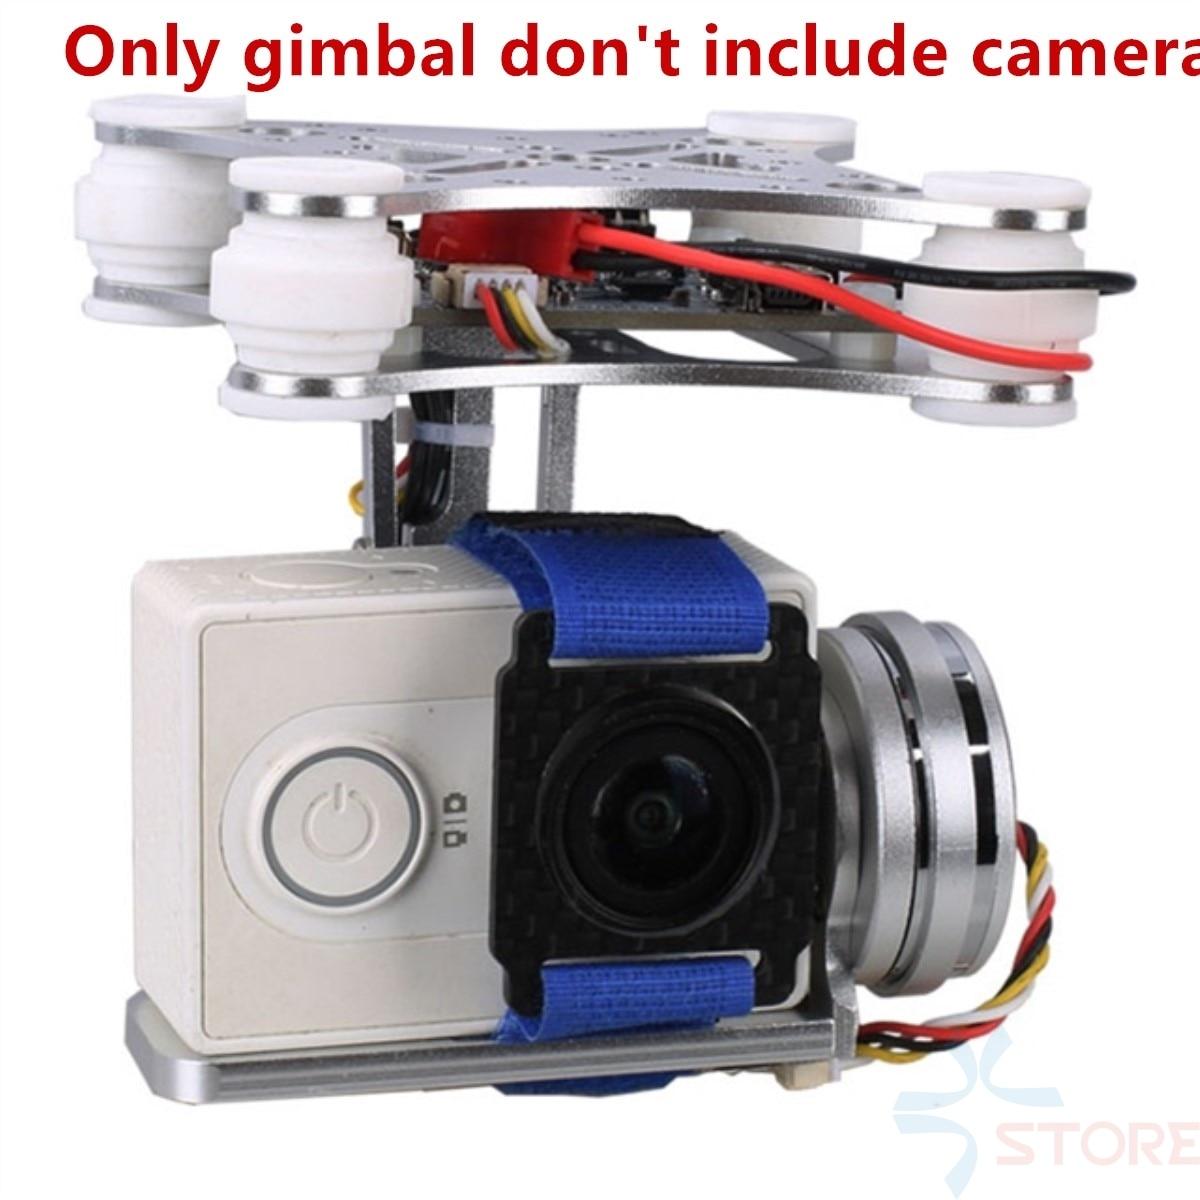 2 Aixs 2D Brushless Camera Gimbal for Gopro SJCAM XIAOMI YI Action Camera Eken F450 F550 S500 FPV Drone Multirotor Quadrocopter